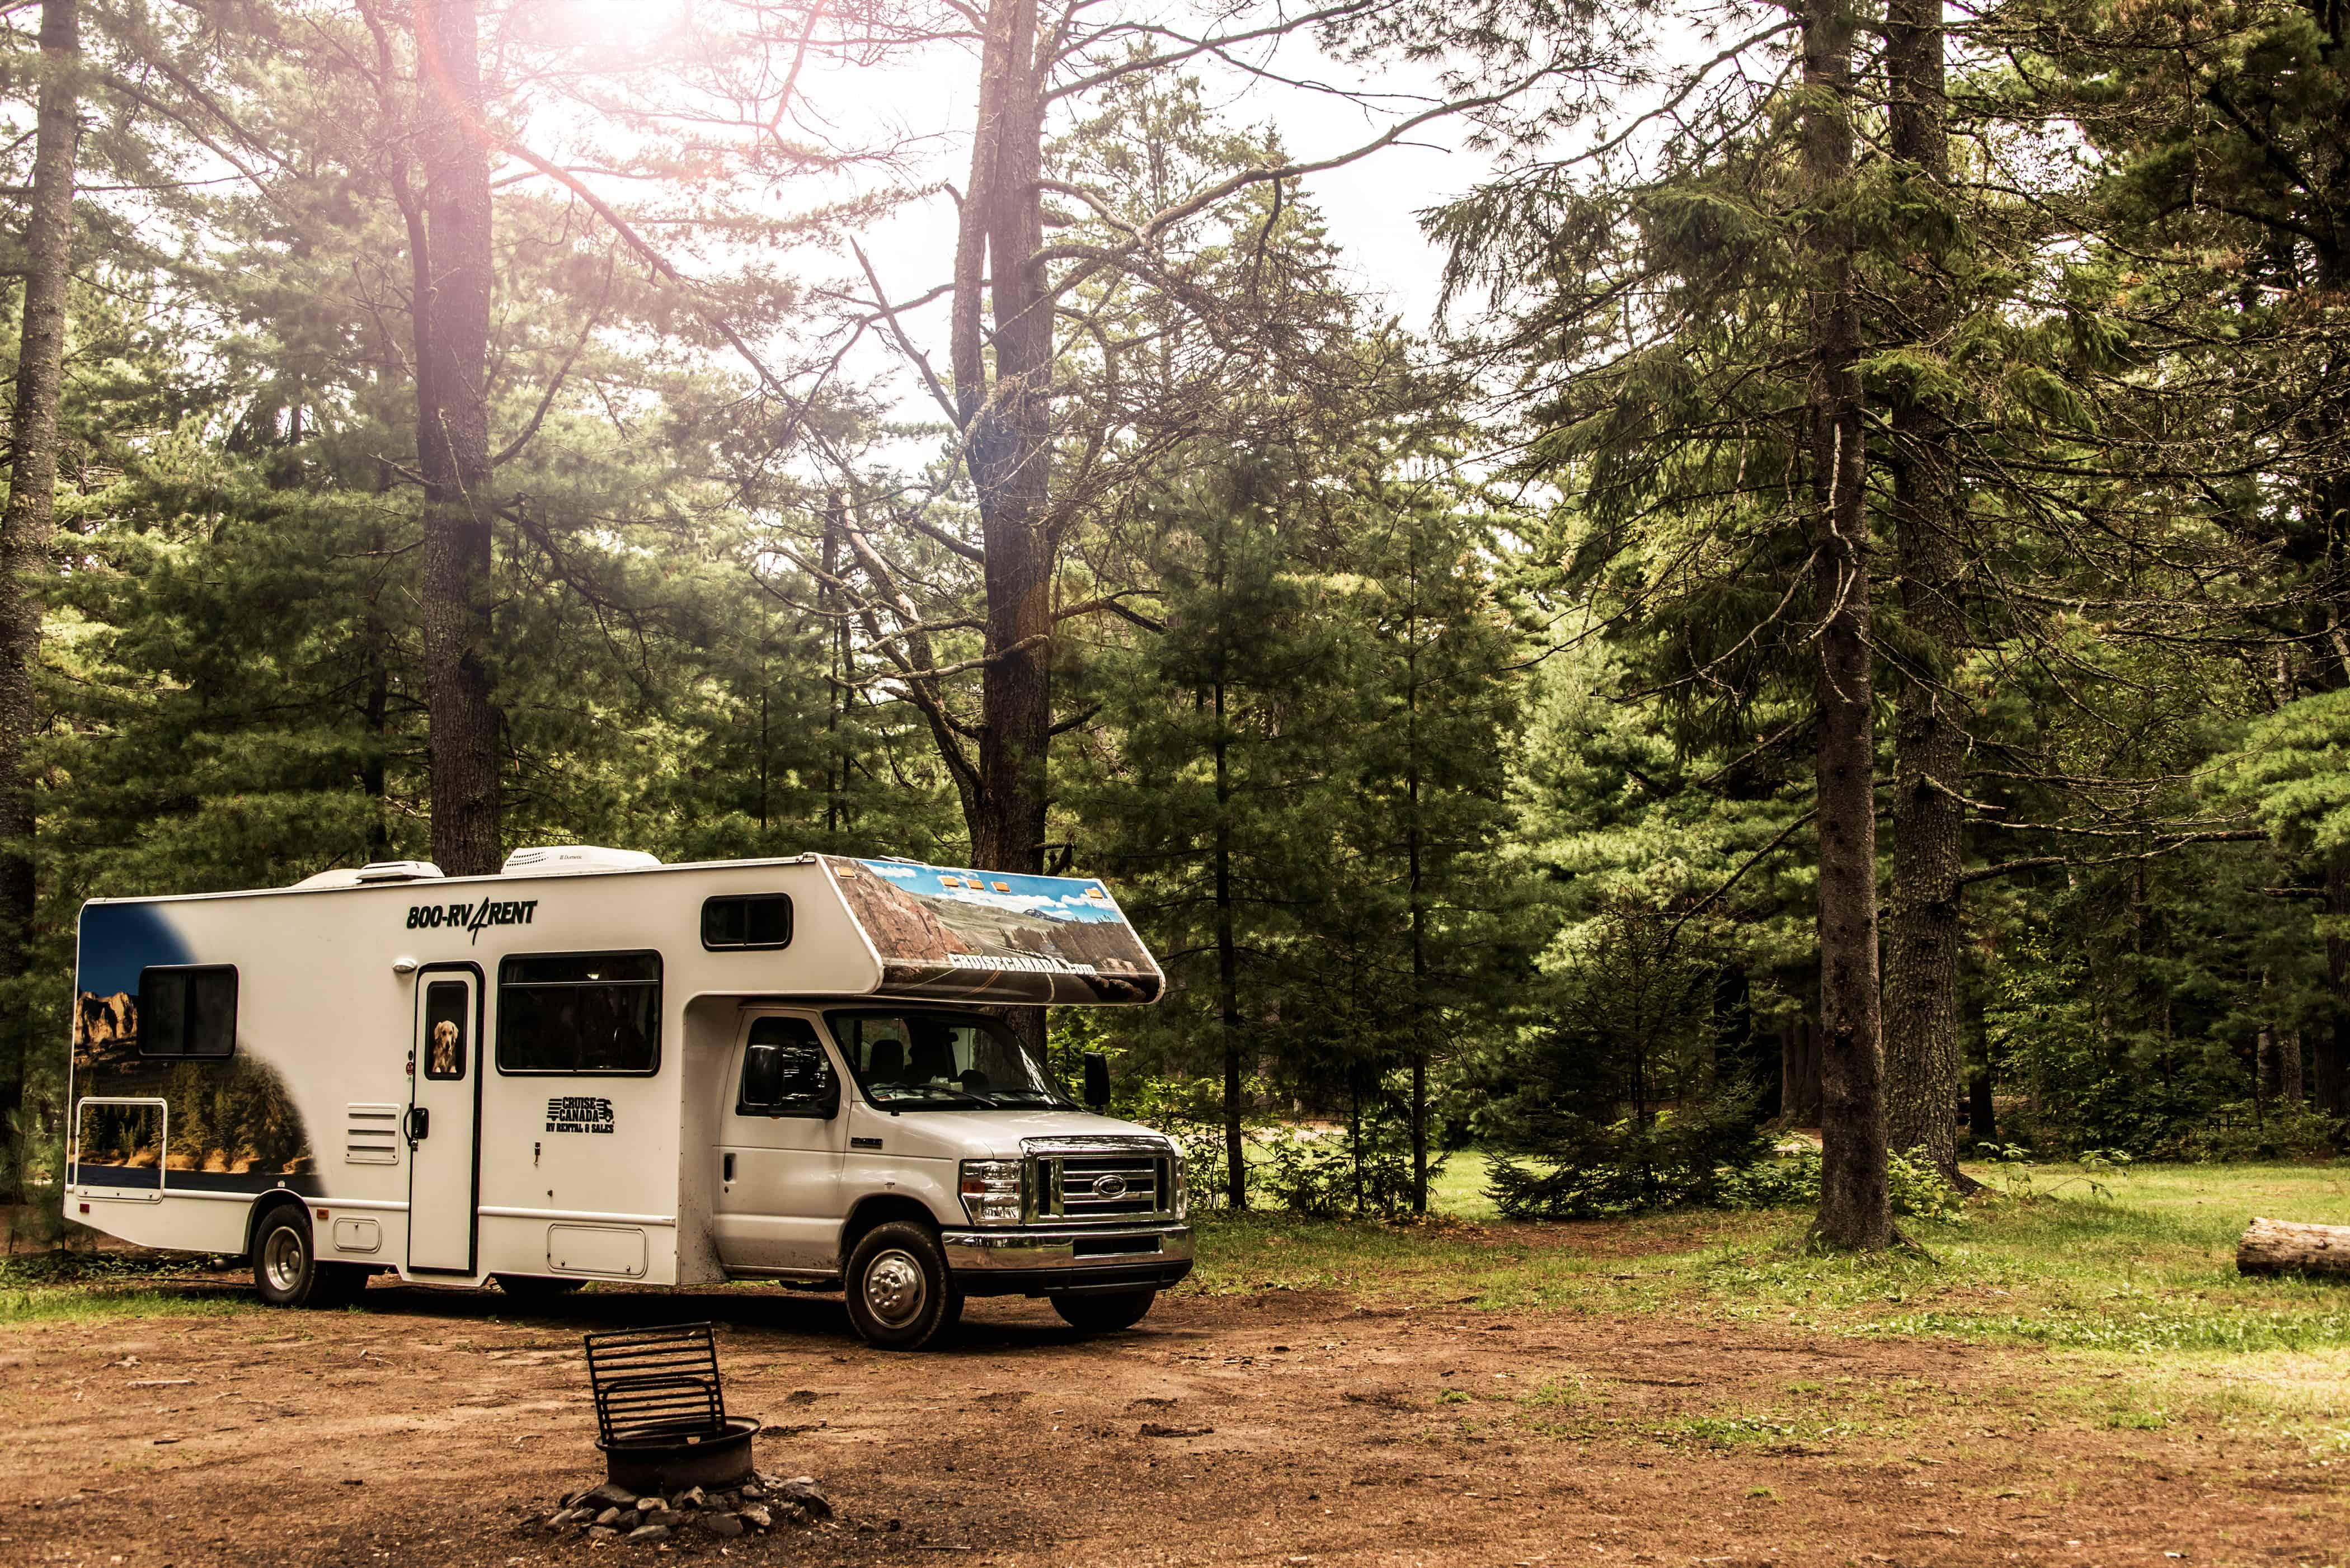 Wohnmobil auf Campingplatz, Cruise Canda